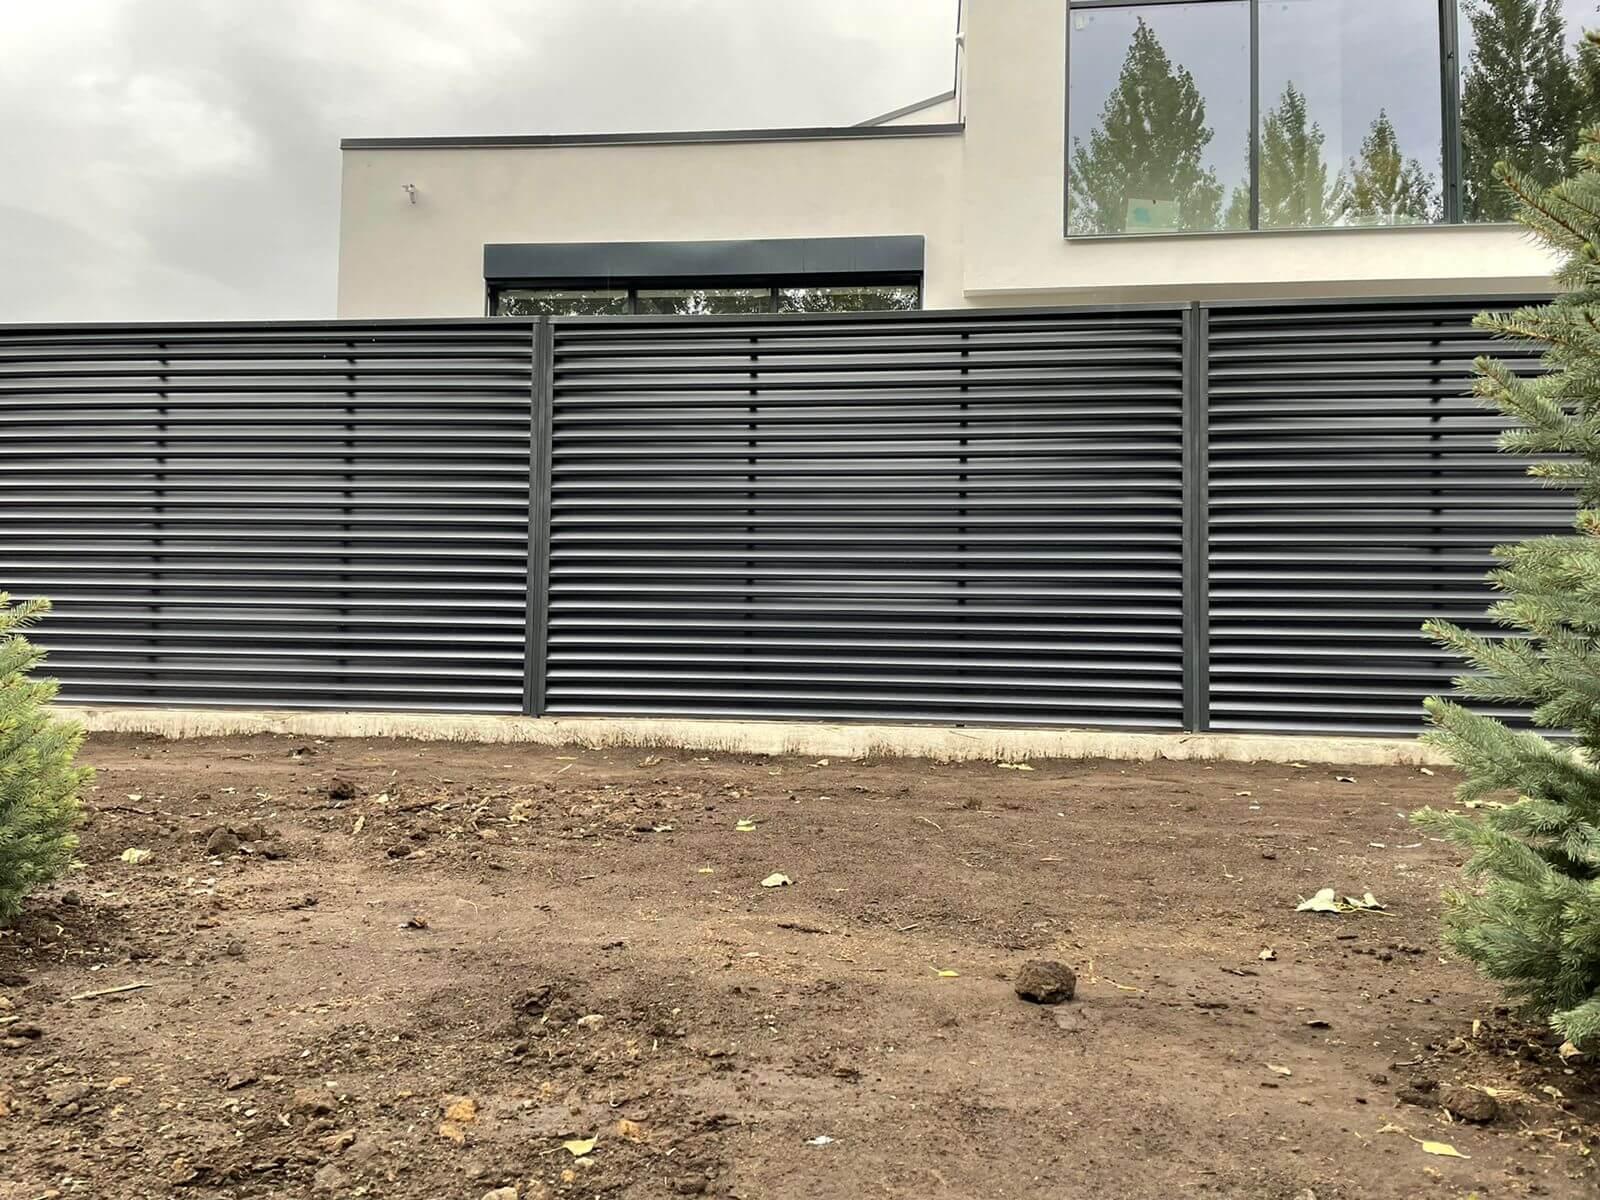 забор-жалюзи с ламелями ЭКО-Z Серый Графит двухсторонний фото5